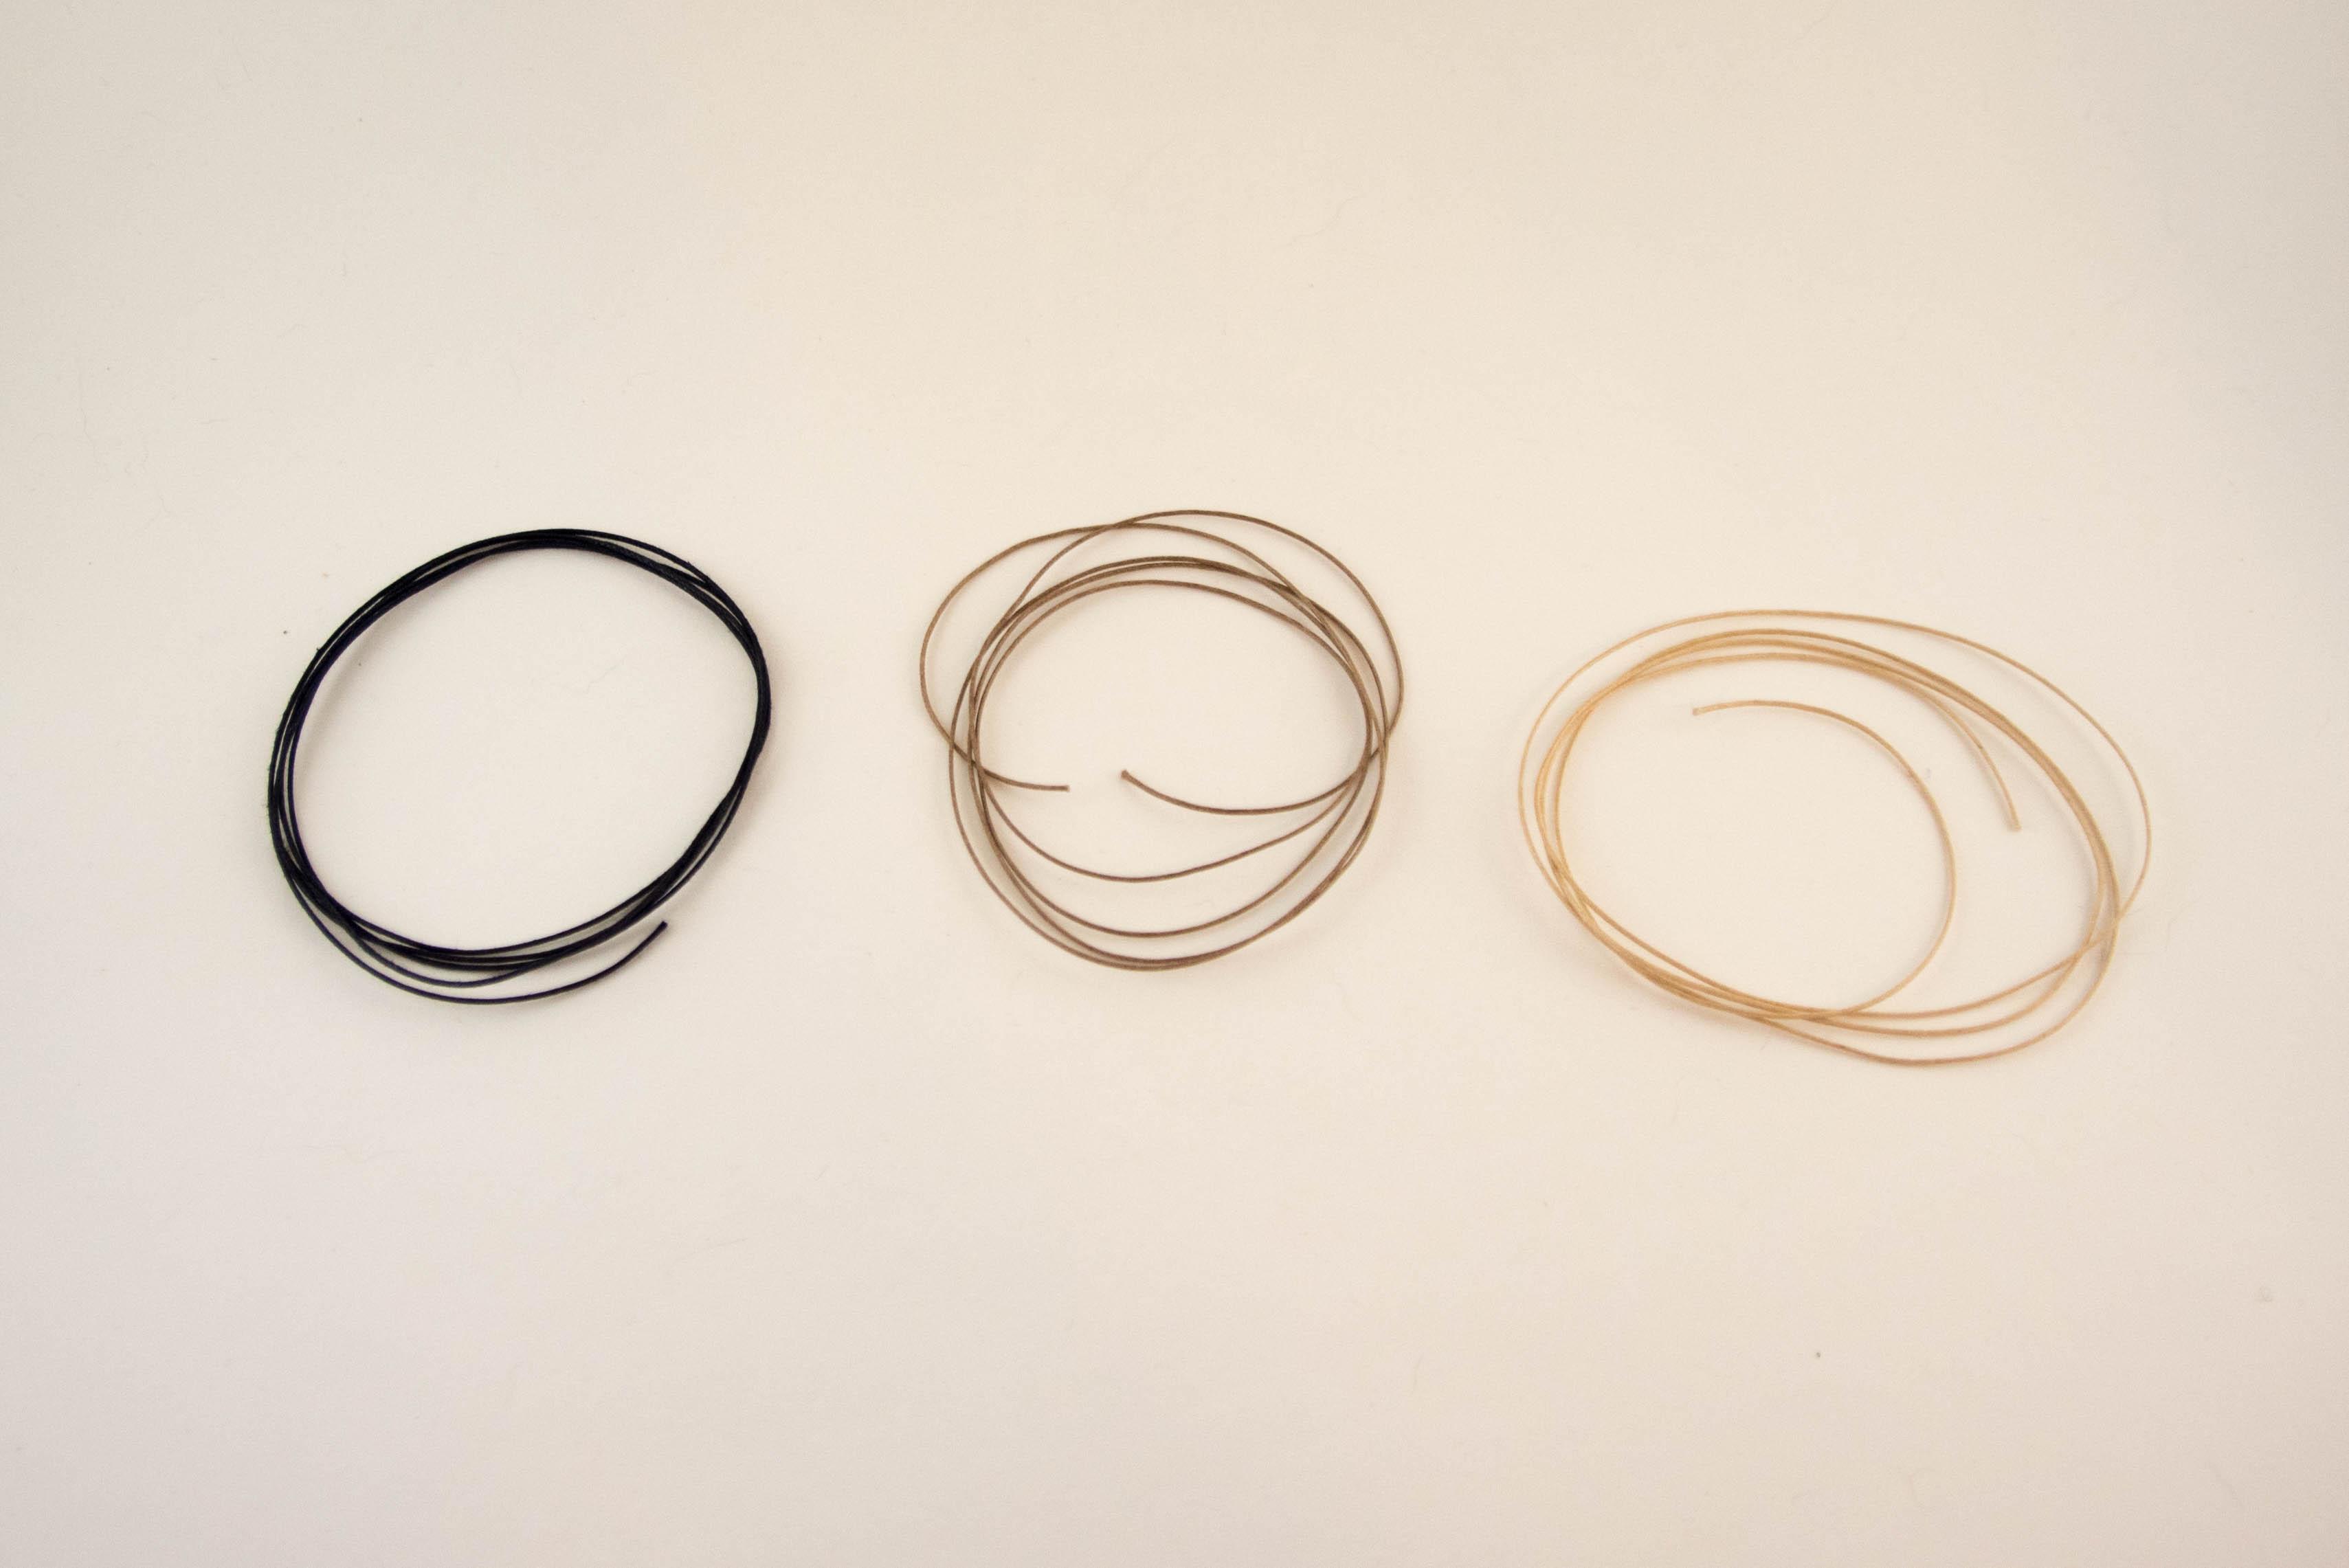 macrame friendship bracelet materials